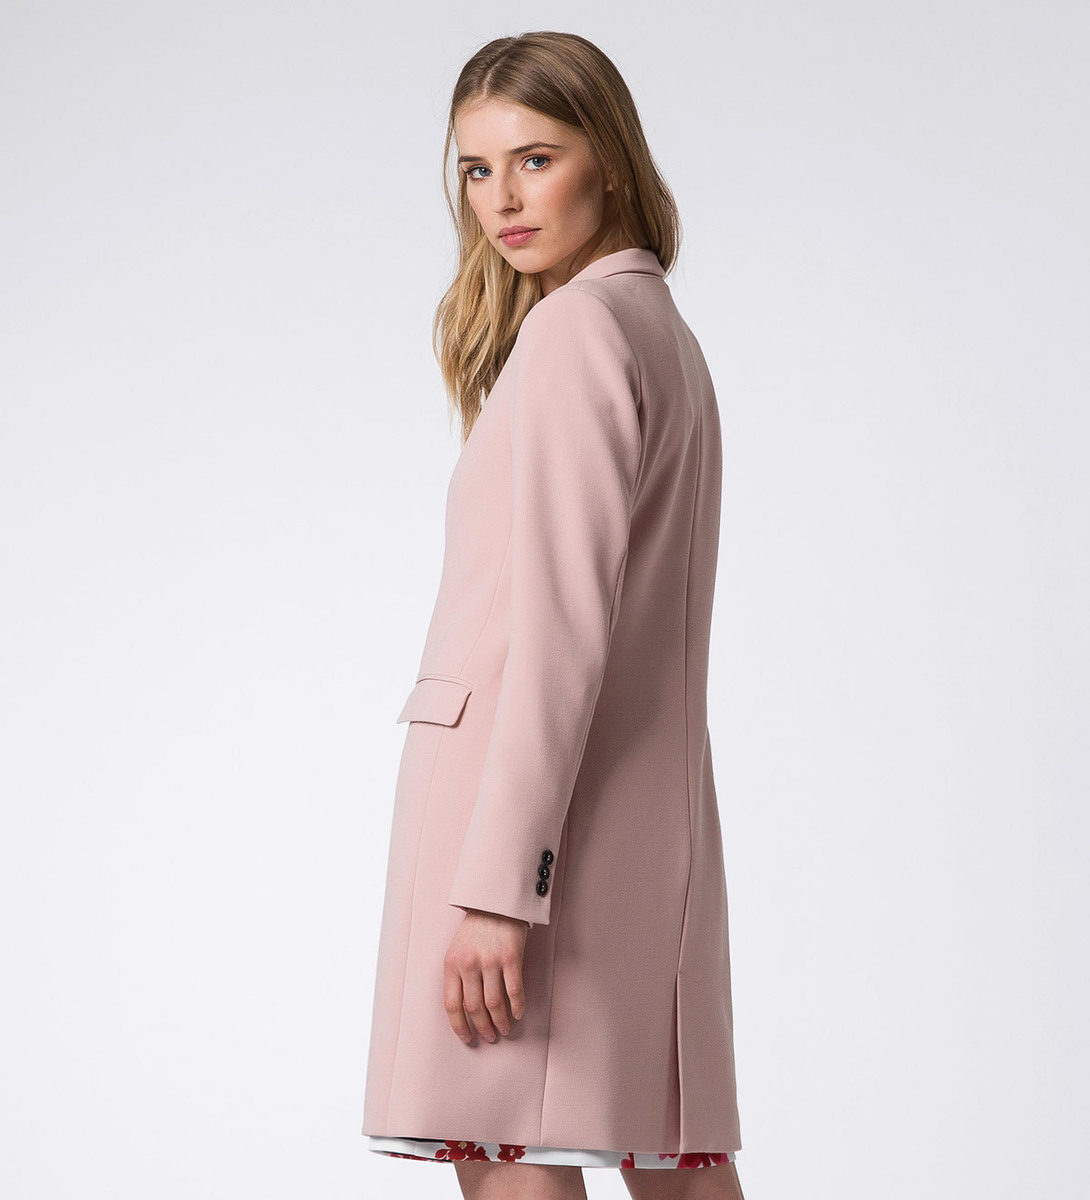 Jacke mit Kontrastknöpfen in rose parfait